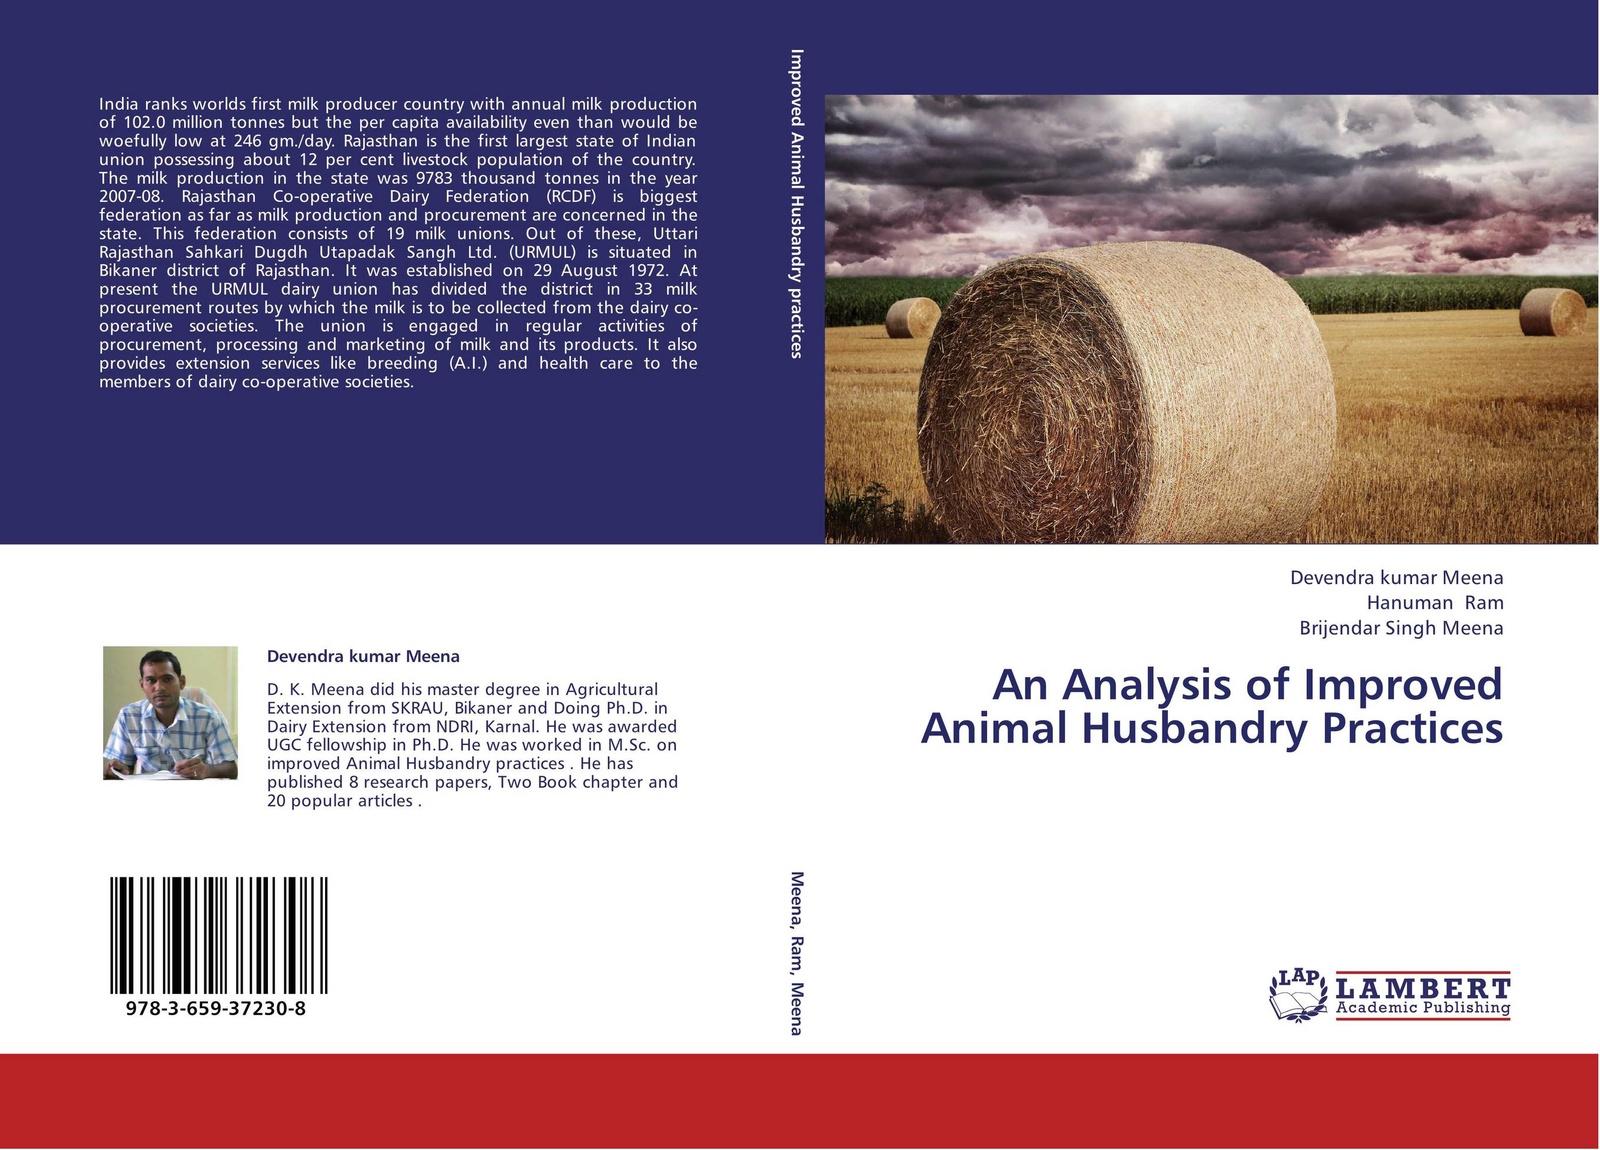 Devendra kumar Meena,Hanuman Ram and Brijendar Singh Meena An Analysis of Improved Animal Husbandry Practices цена в Москве и Питере